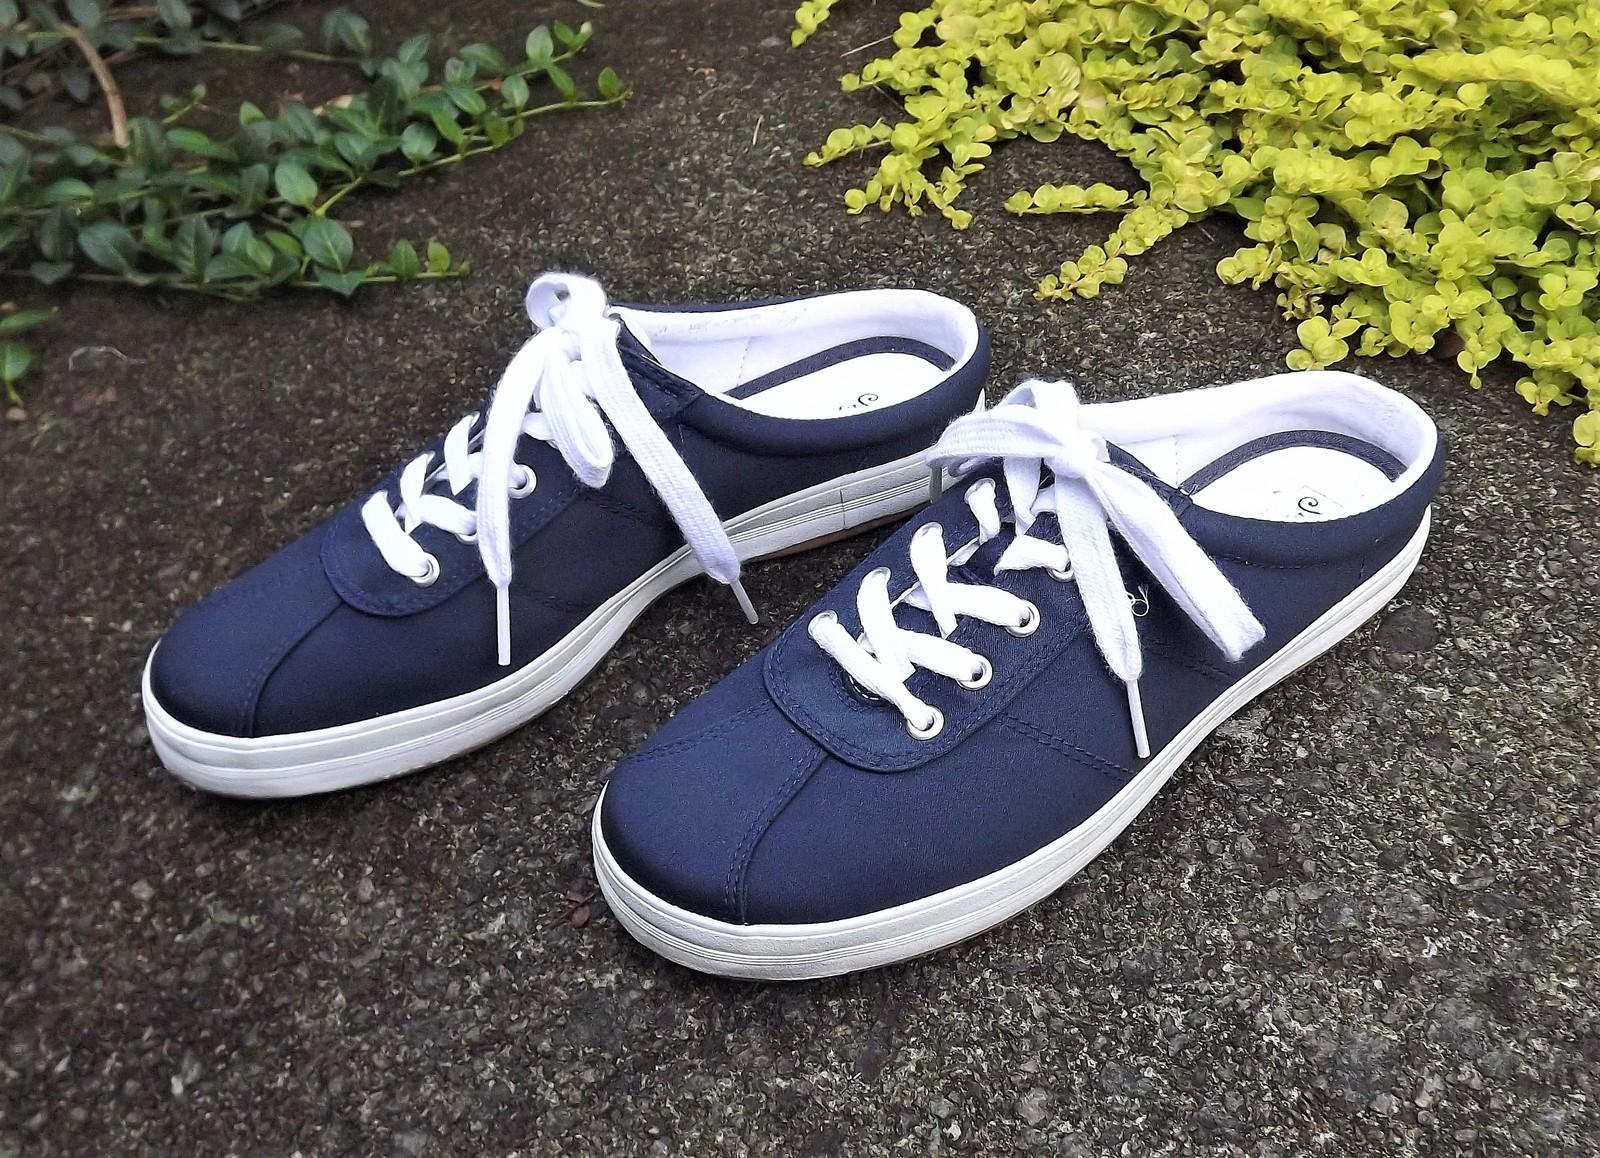 4d3a030953e Navy blue sling back tennis shoes 3. Navy blue sling back tennis shoes 3.  Previous. Navy Blue Canvas Slingback Open Heel Lace Up Tennis Shoe Women US  Size 8 ...